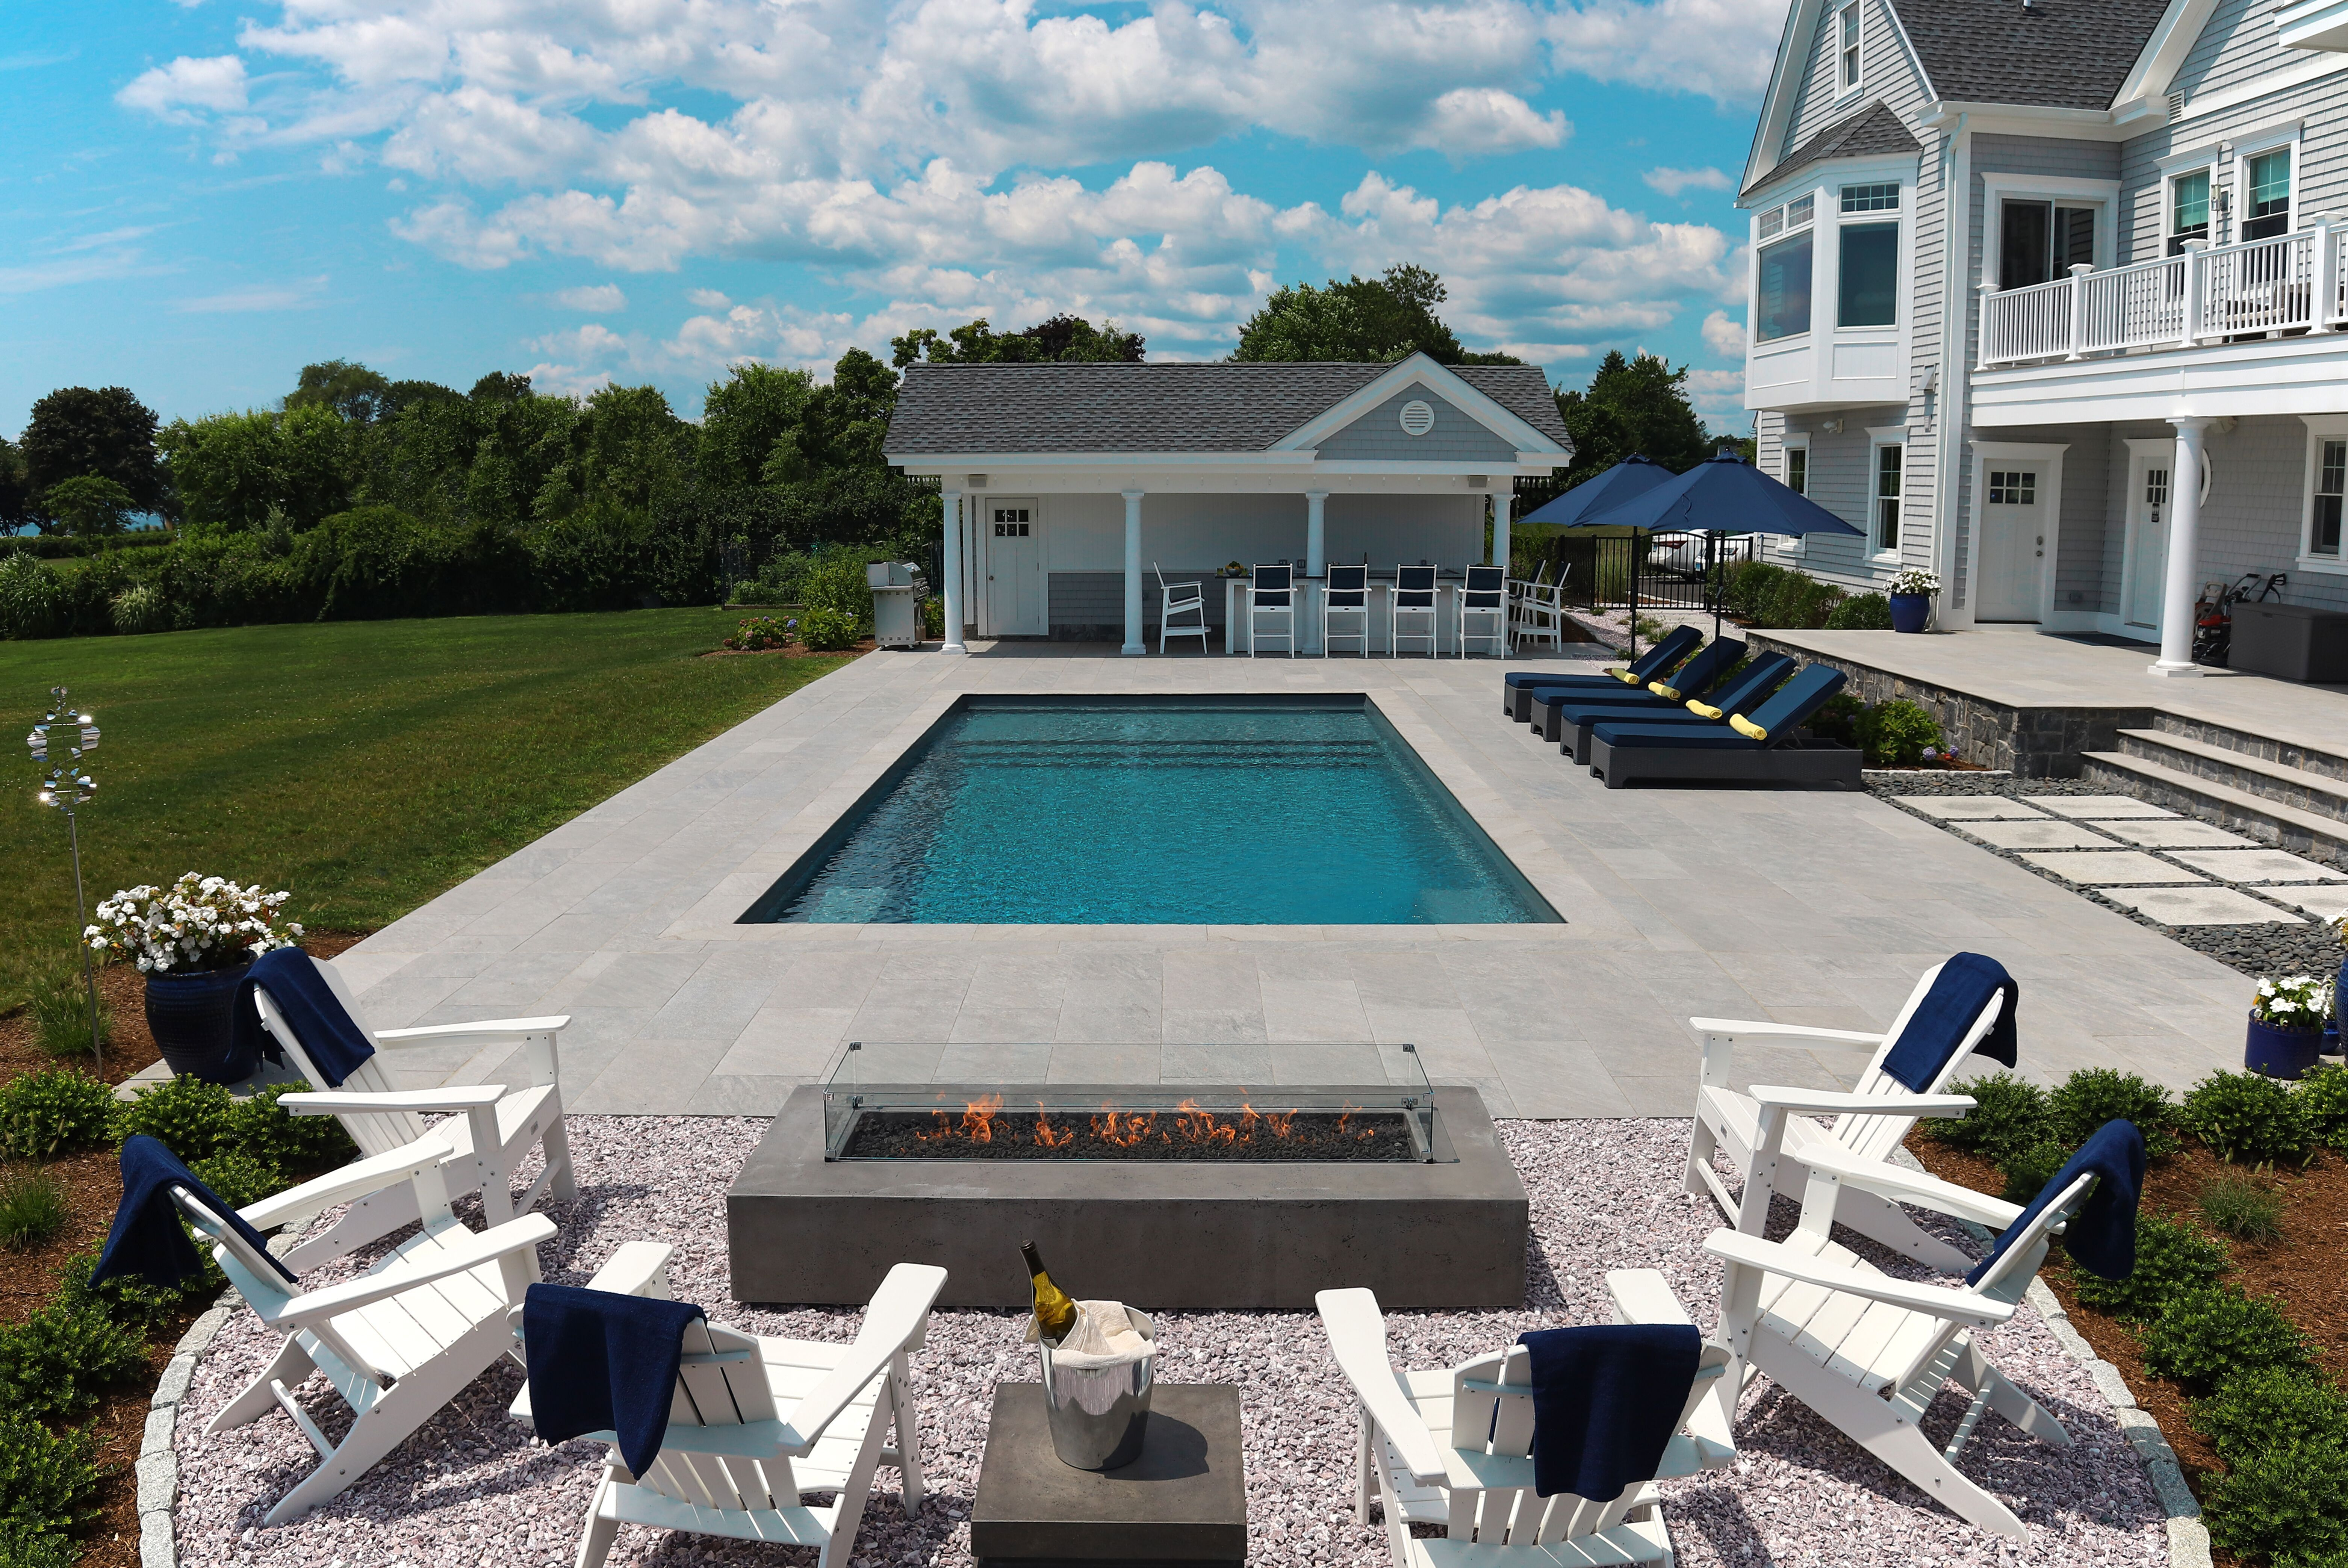 Leisure Pools The Pinnacle Swimming Pools Inground Leisure Pools Swimming Pools